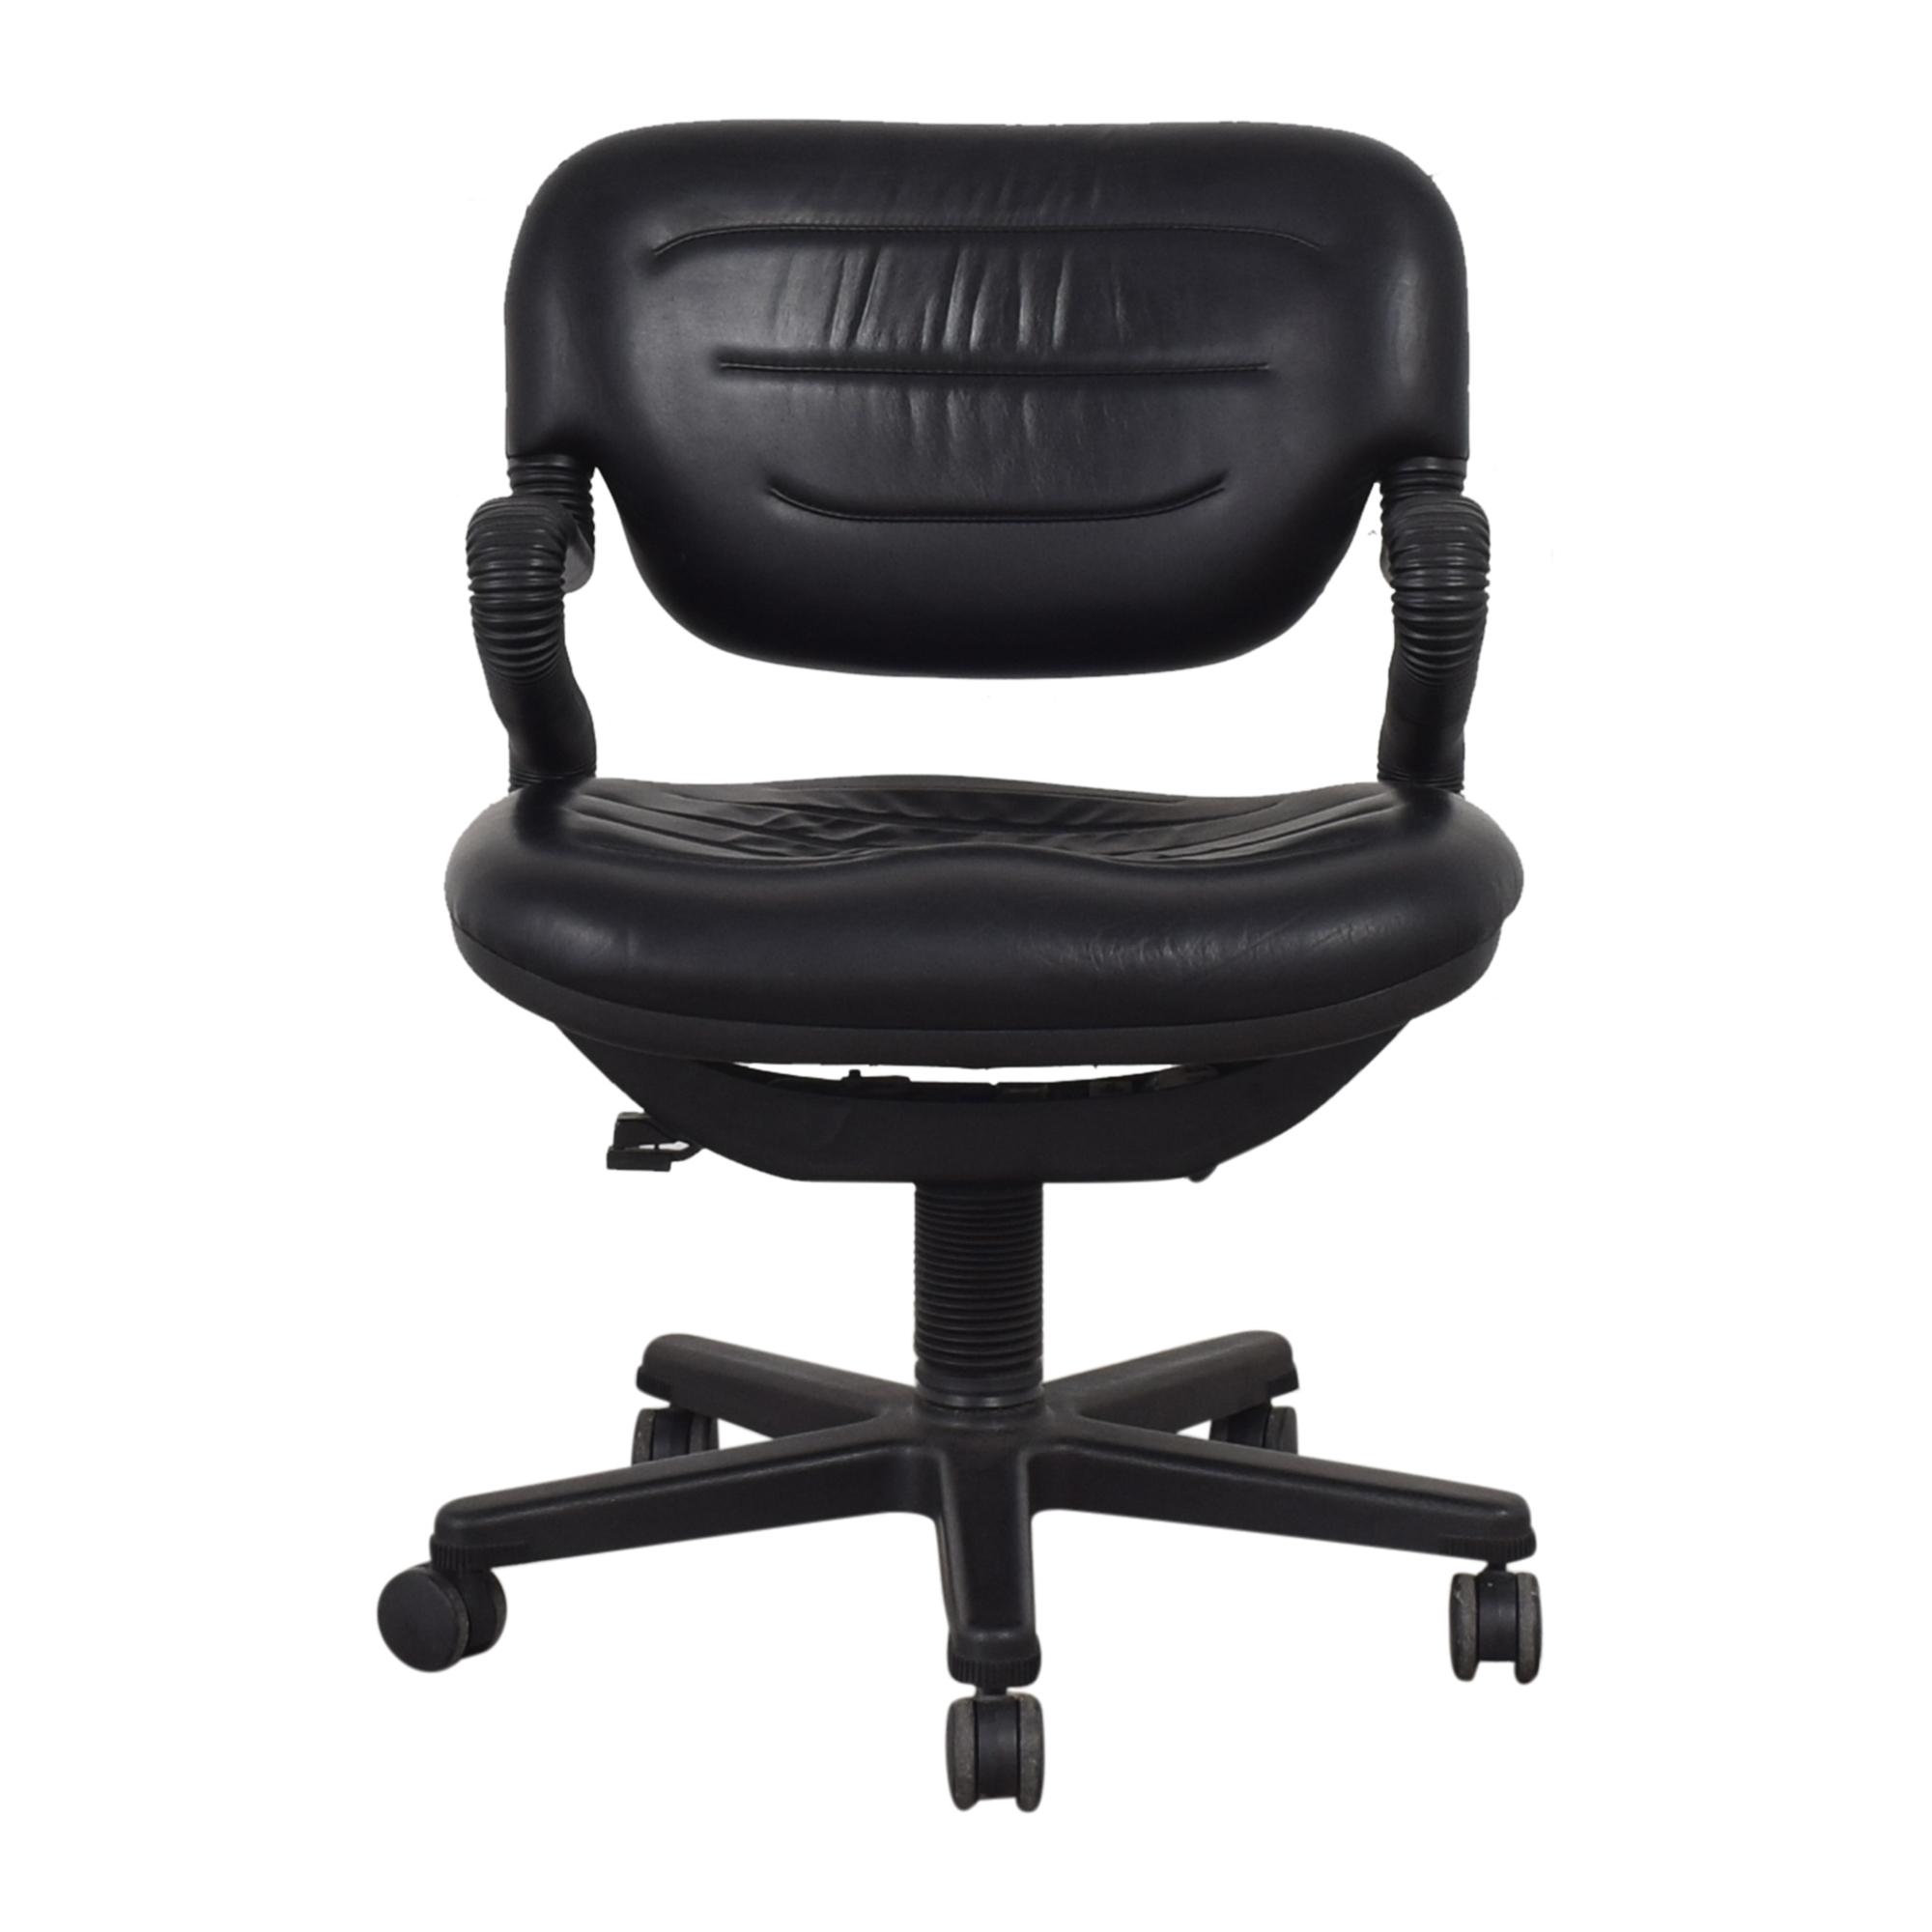 OpenARK Vertebra Office Chair / Chairs